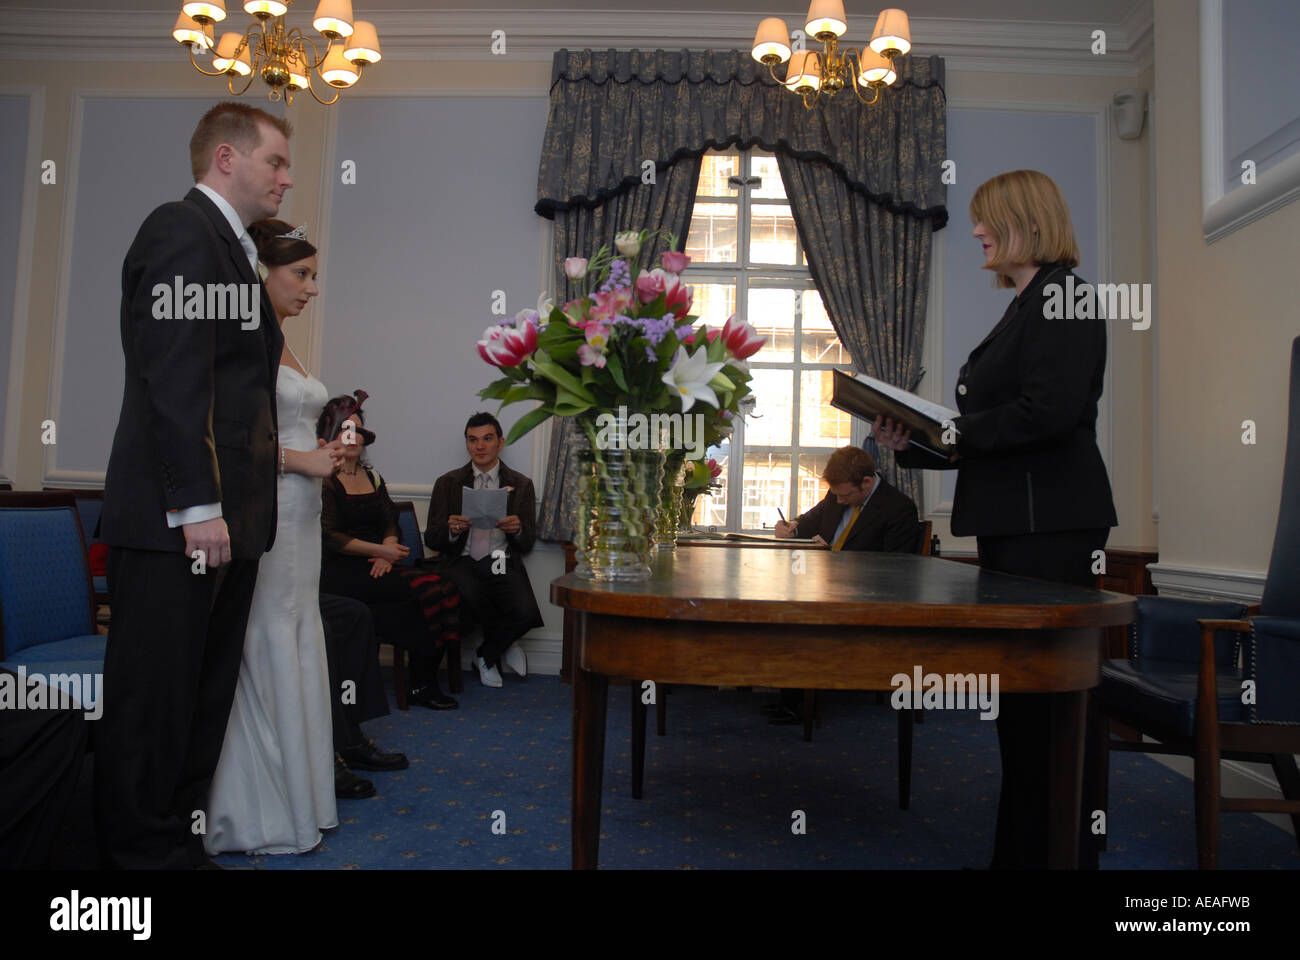 78 Registry Office Wedding Ceremony